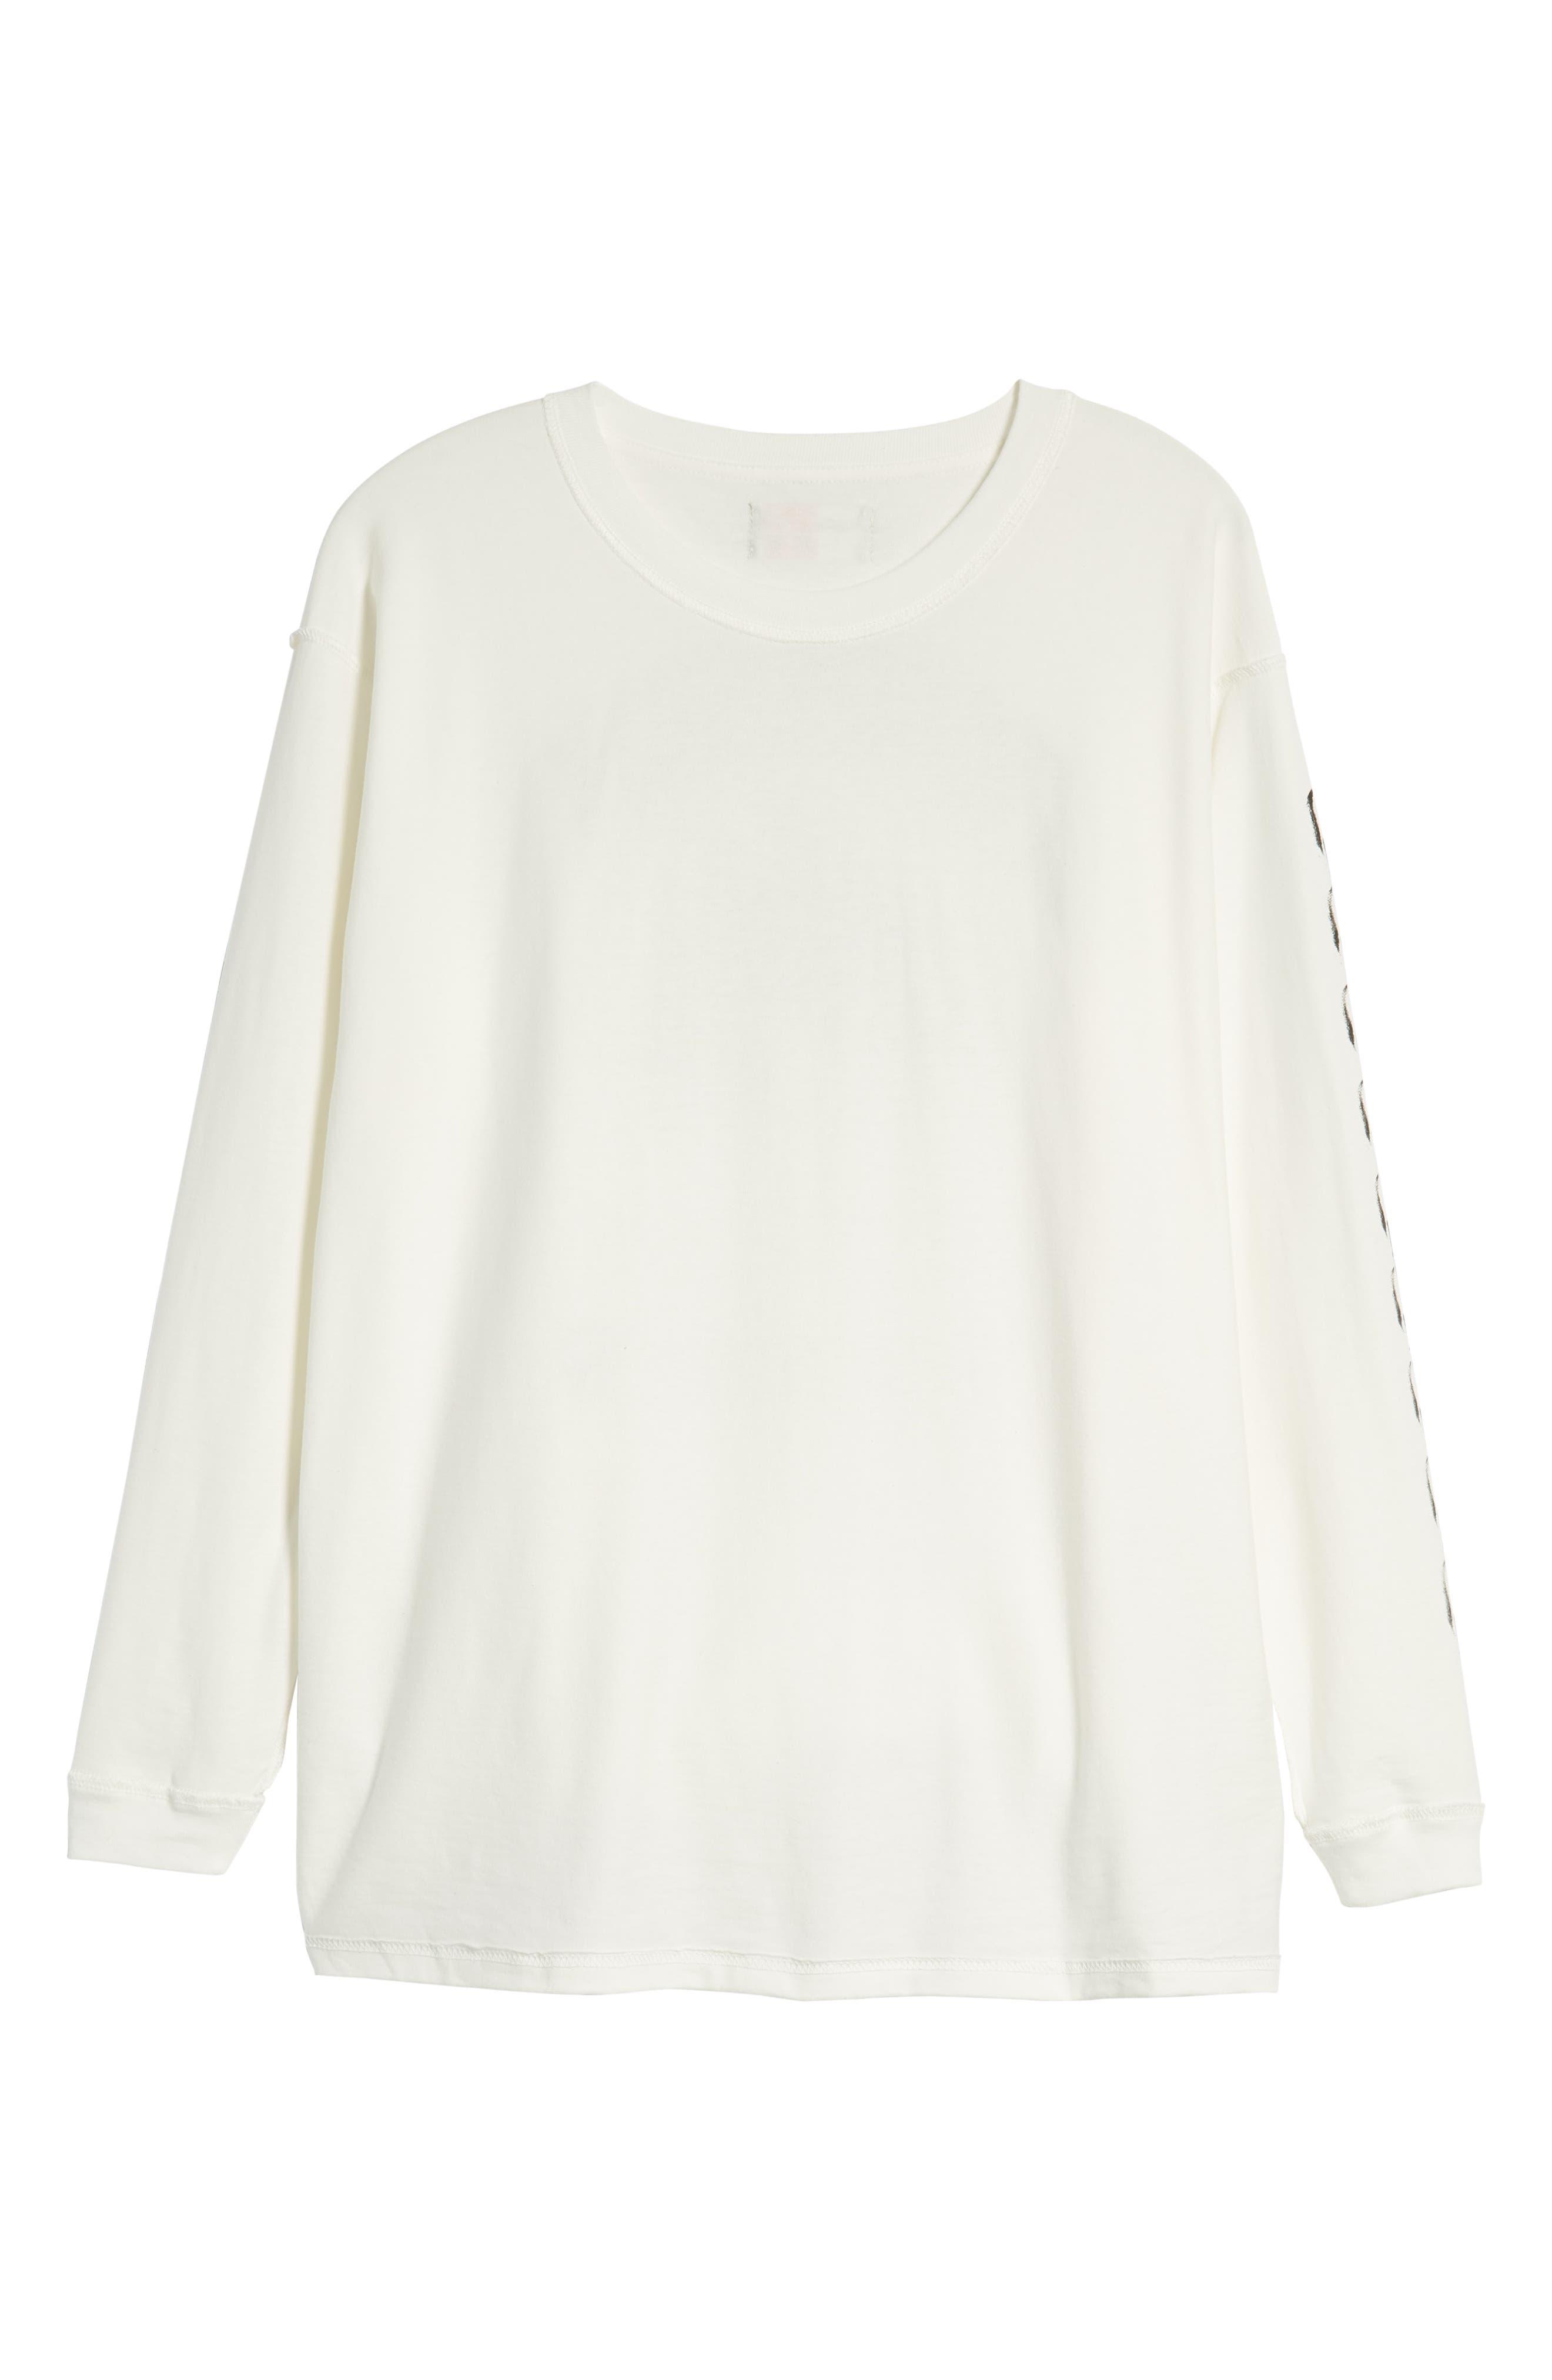 Represent Records Long Sleeve T-Shirt,                             Alternate thumbnail 6, color,                             WHITE